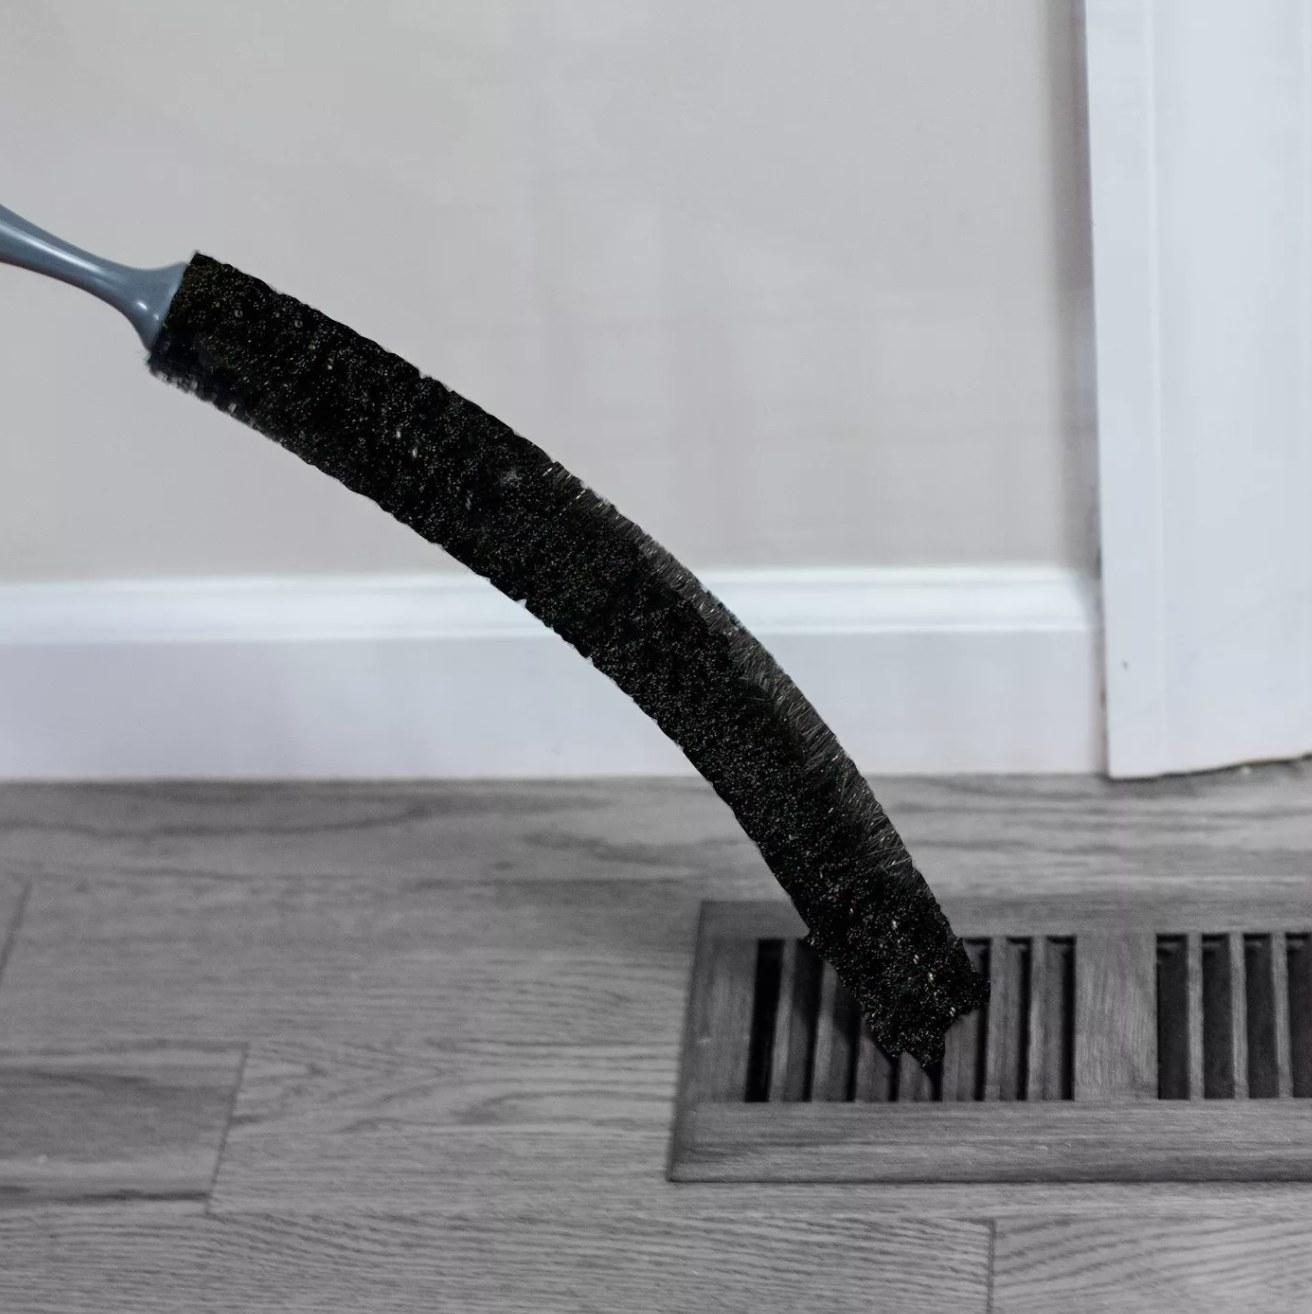 Black bristled brush sweeps dust out of a hardwood floor radiator